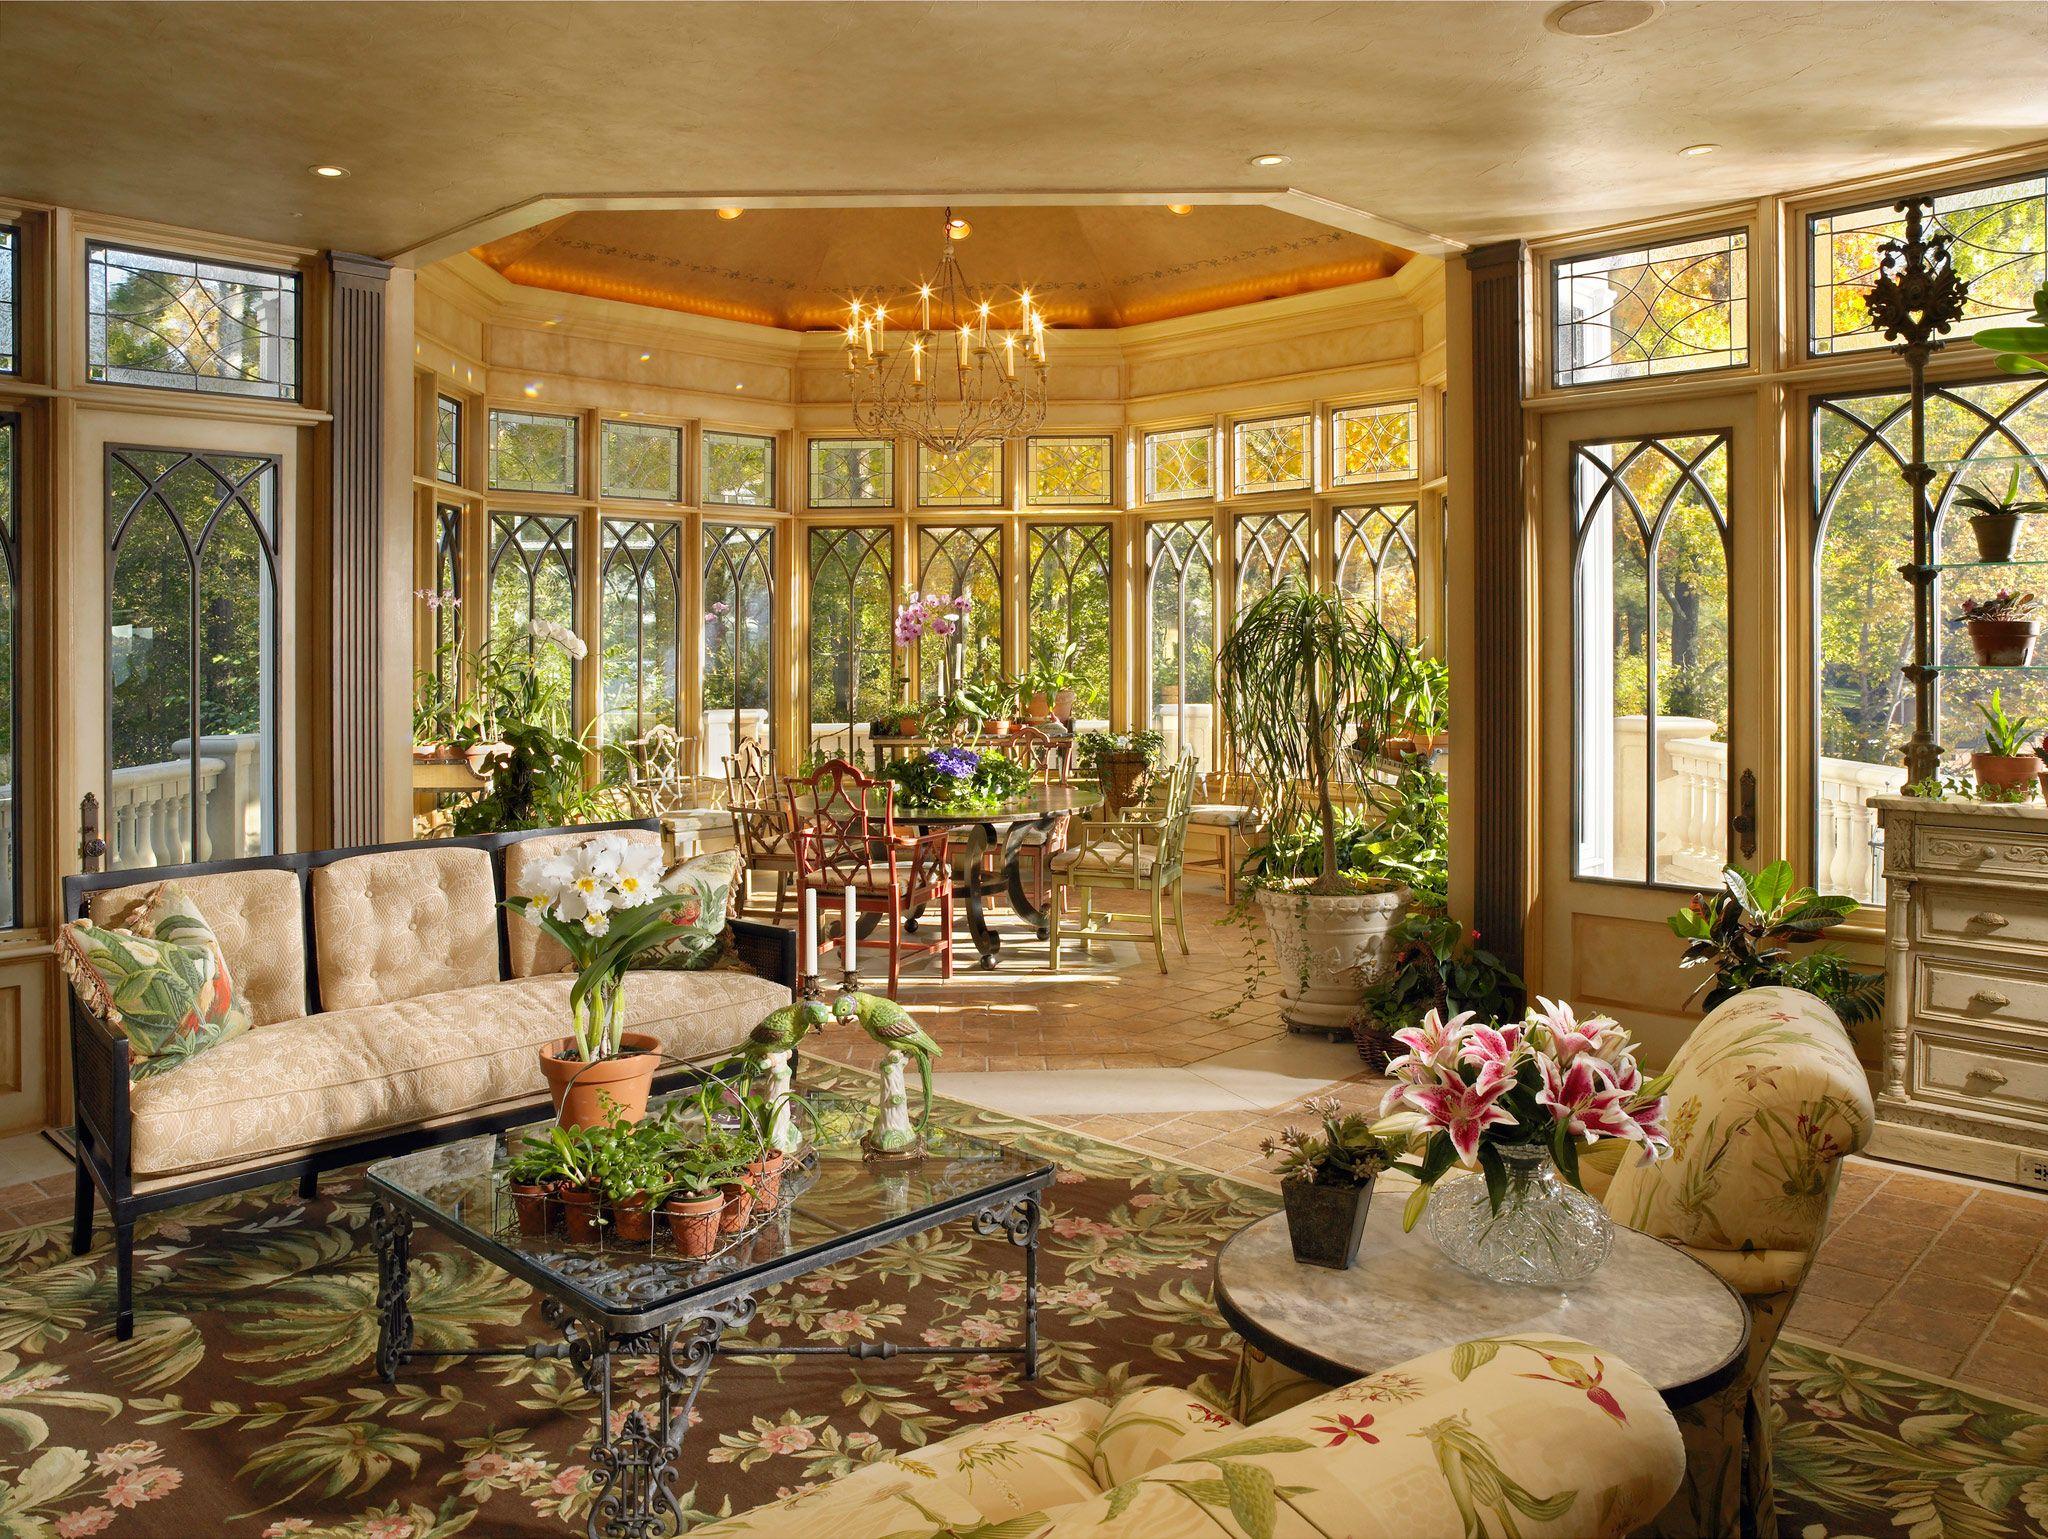 19 best John B. Scholz - Luxury Homes images on Pinterest | Luxury ...